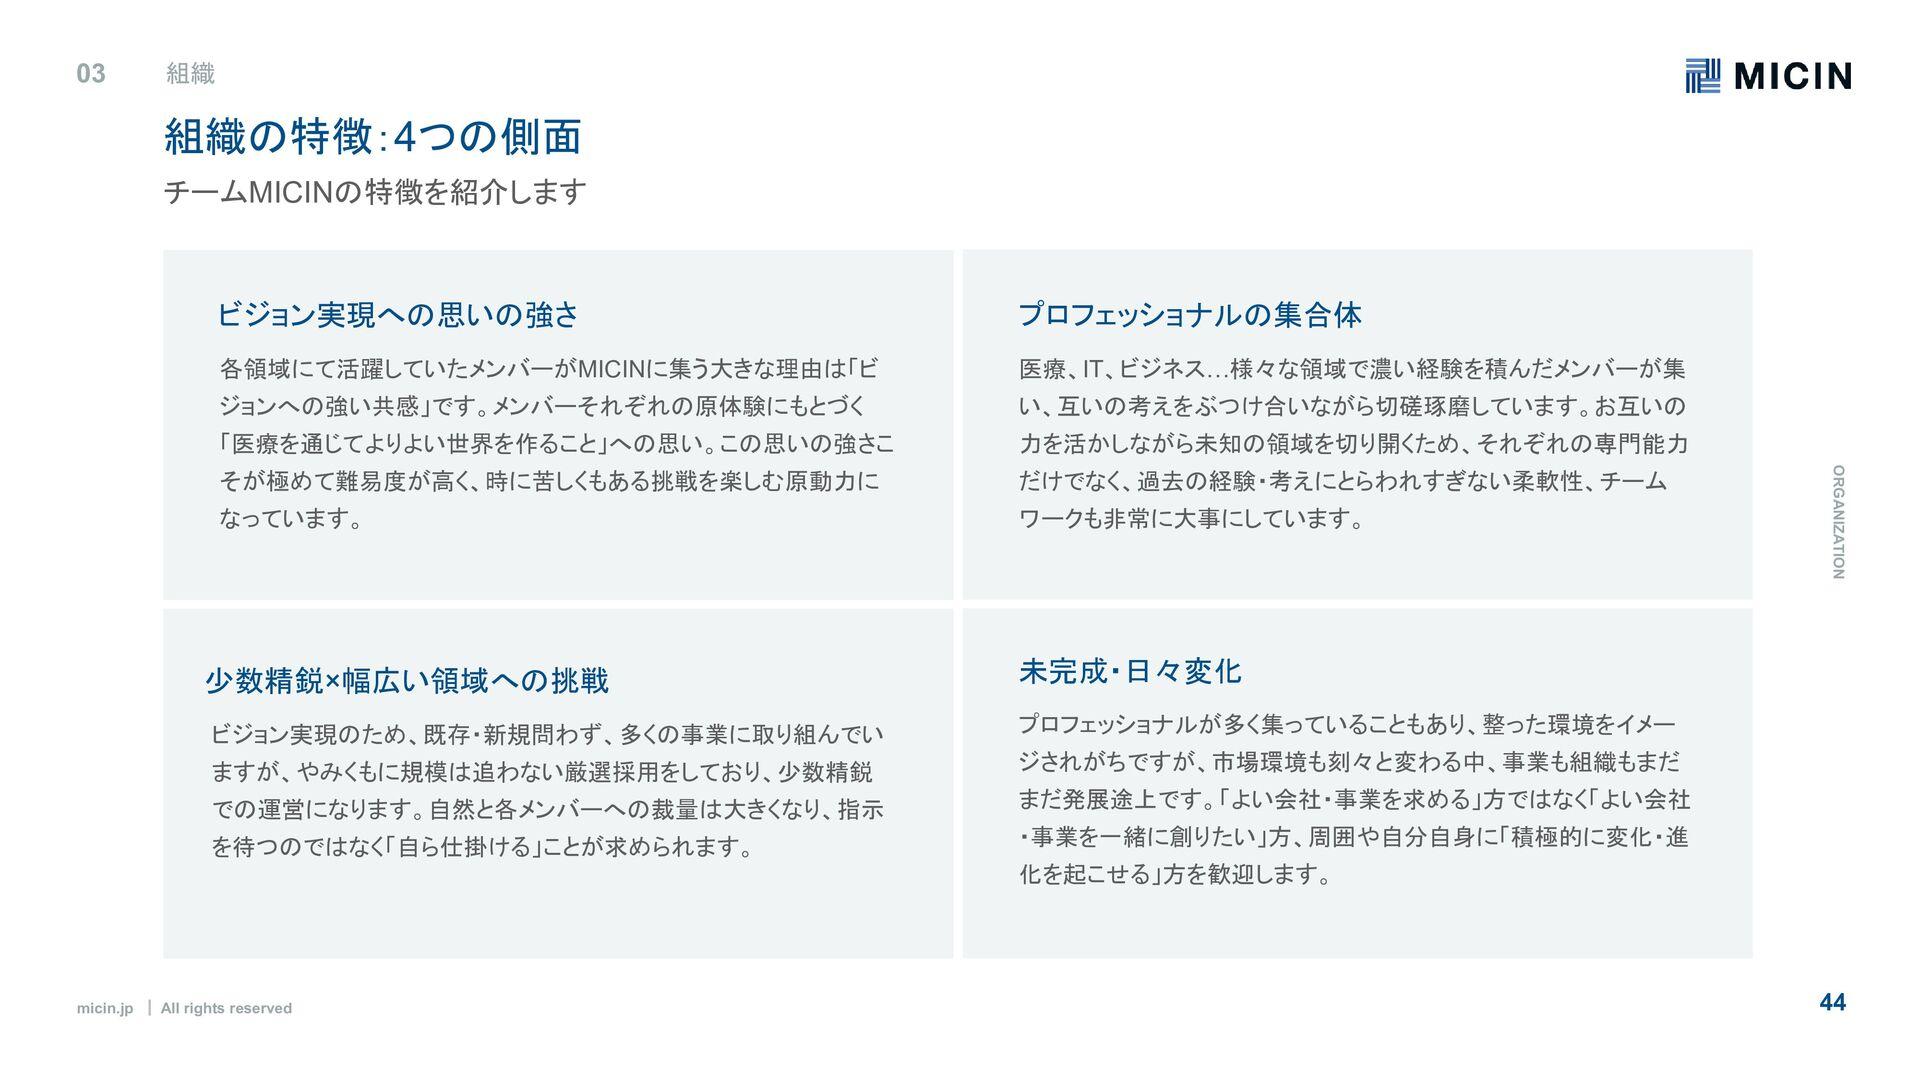 micin.jp   All rights reserved 44 採用情報 MICINエンジ...